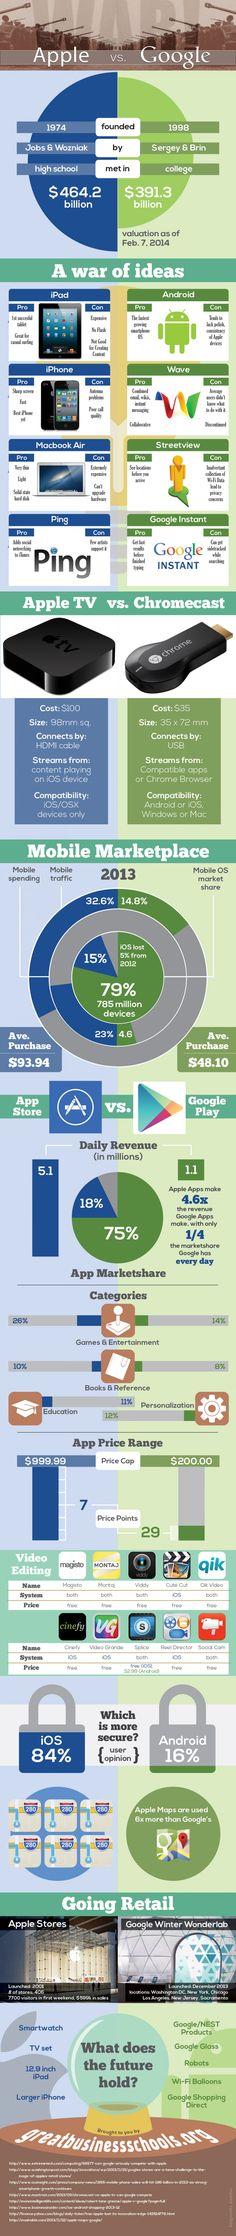 Google vs. Apple Infographic - Best Infographics